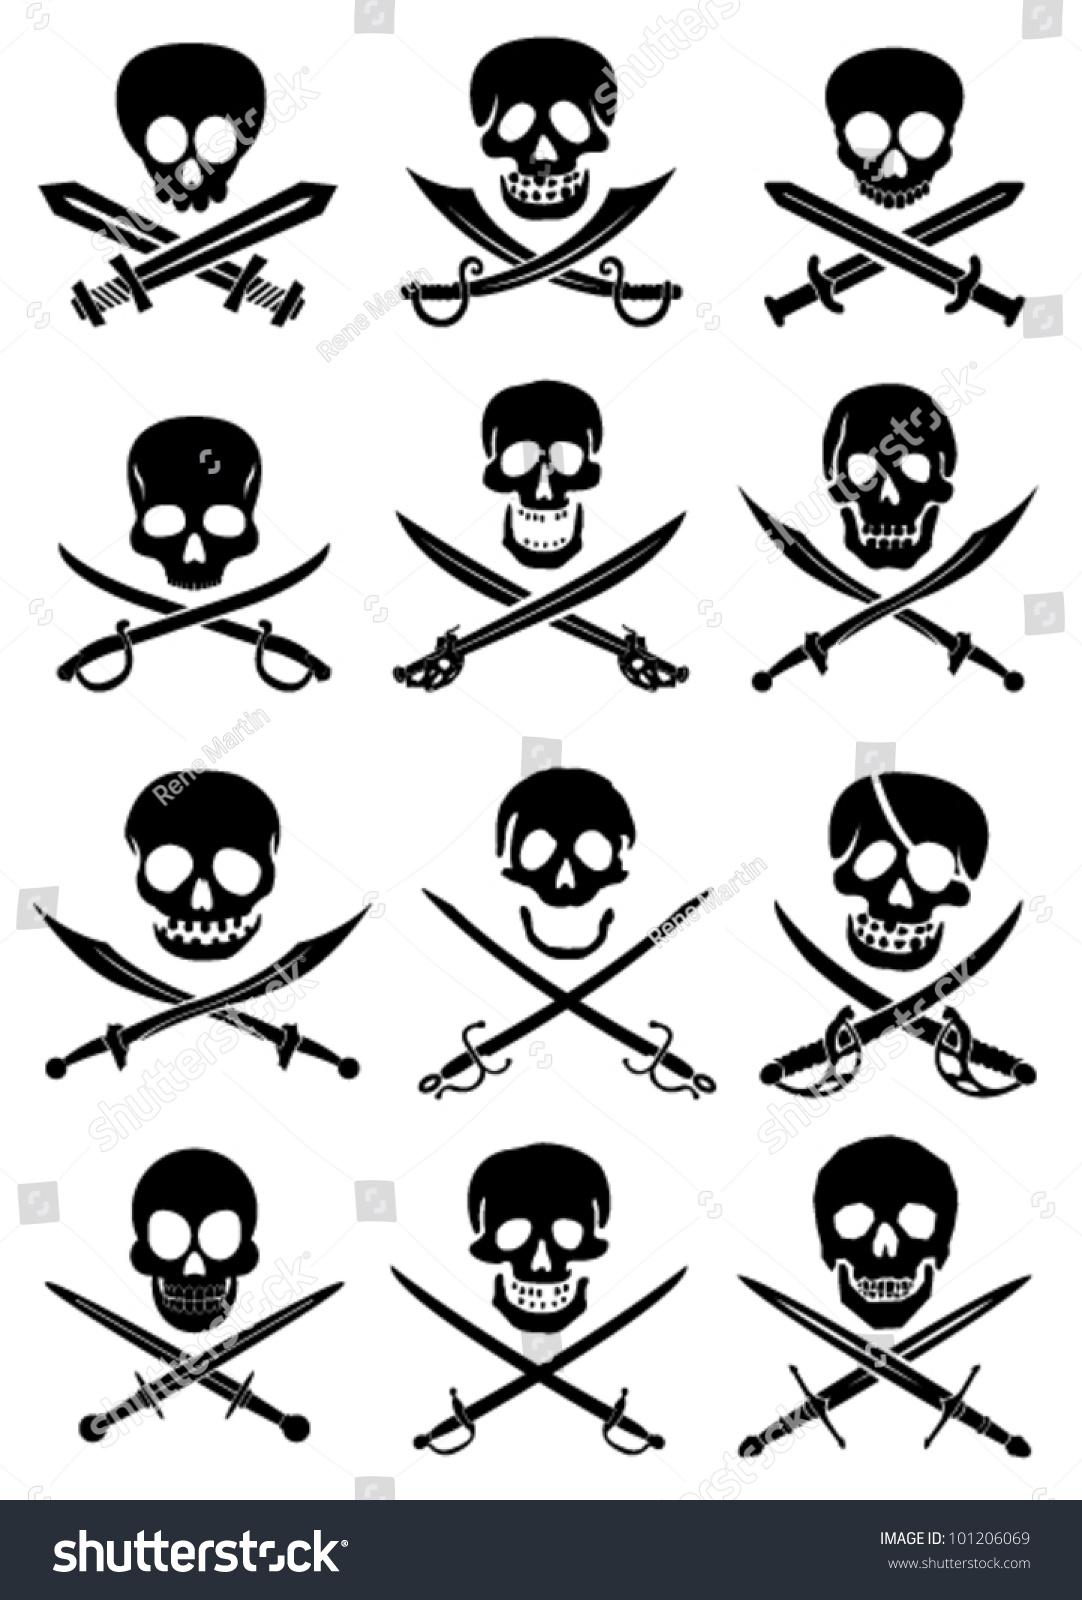 Crossed swords skulls vector collection white stock vector for Crossed swords tattoo